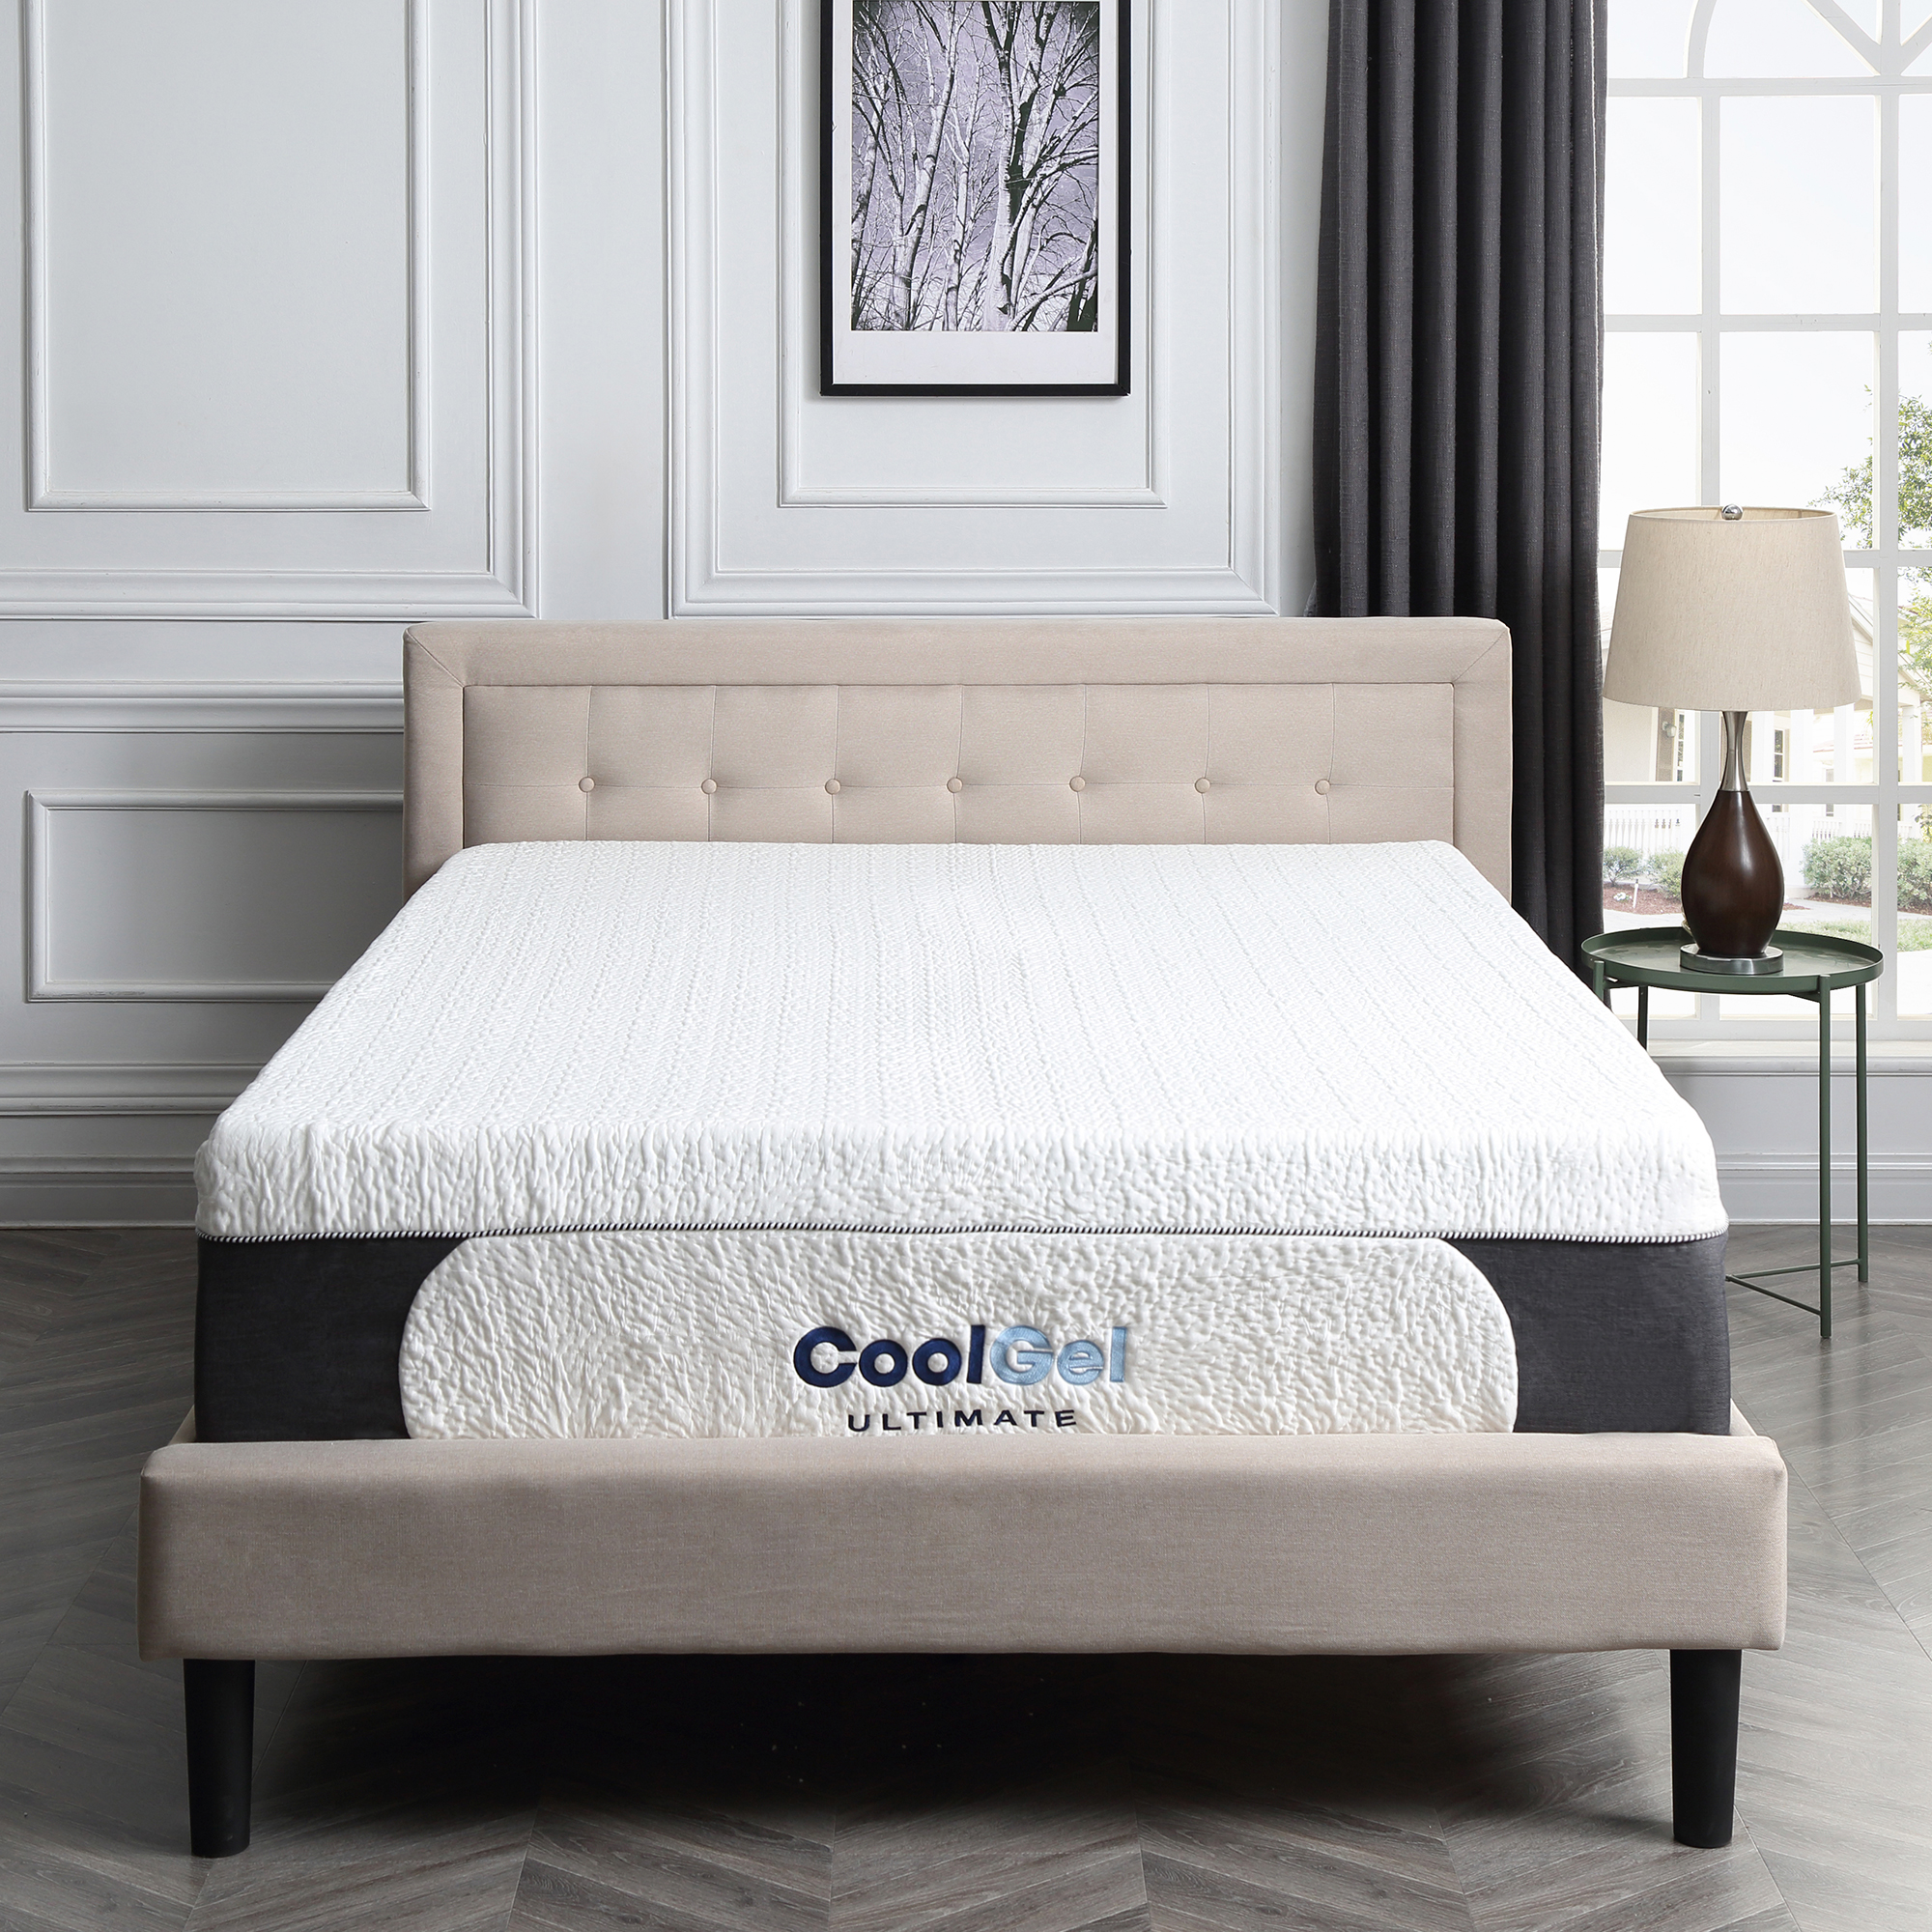 Comfort Revolution Sealy 14 Inch Twin Size Memory Foam Mattress